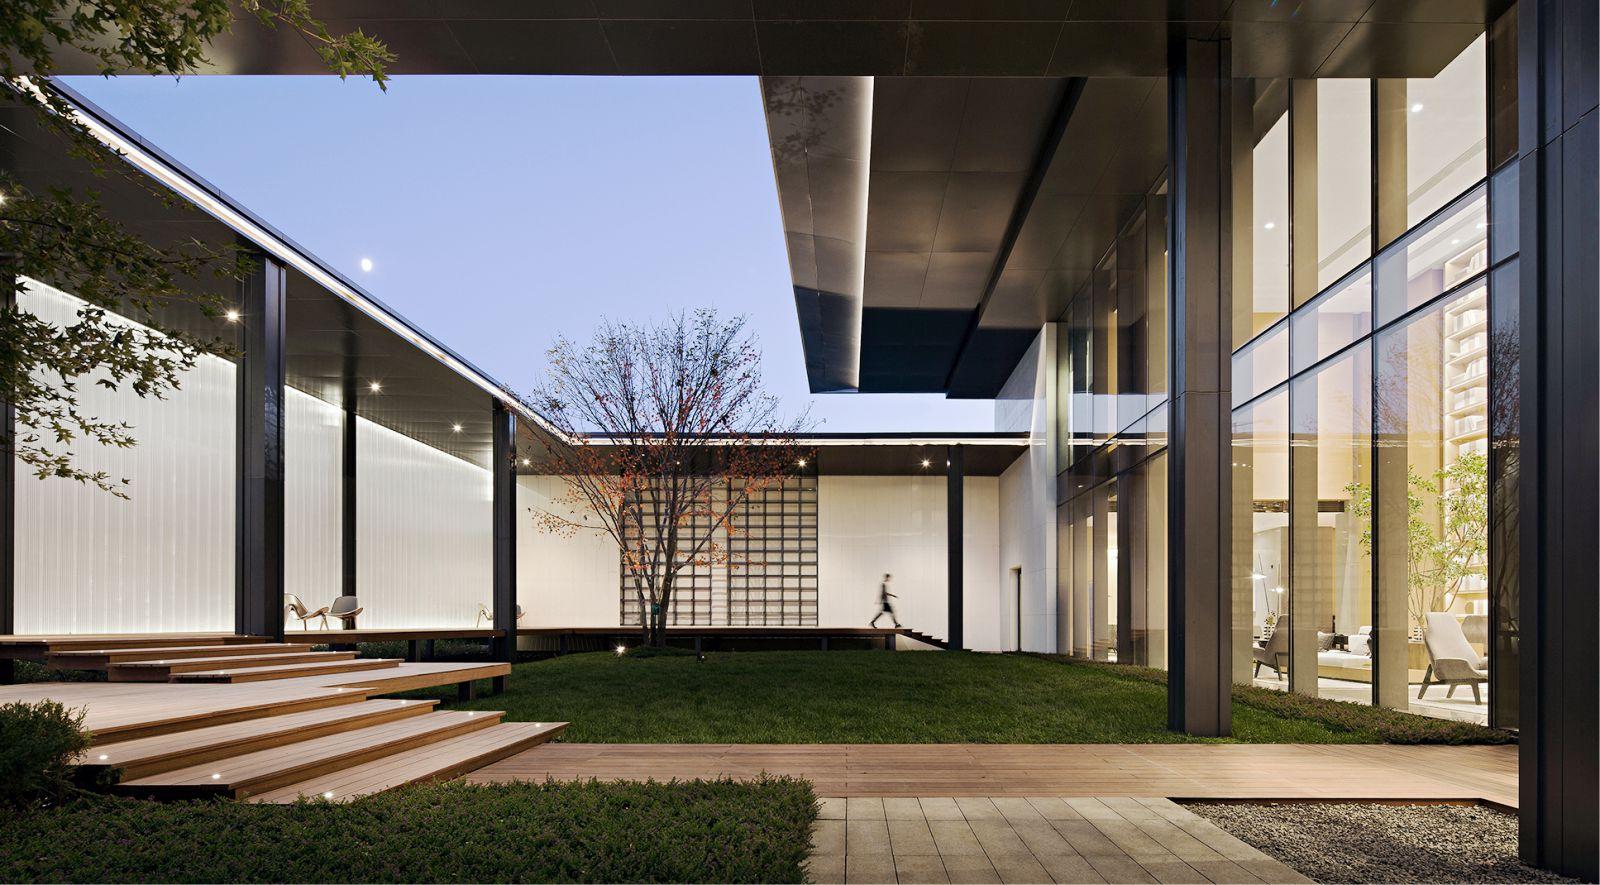 Wang Jing Mansion